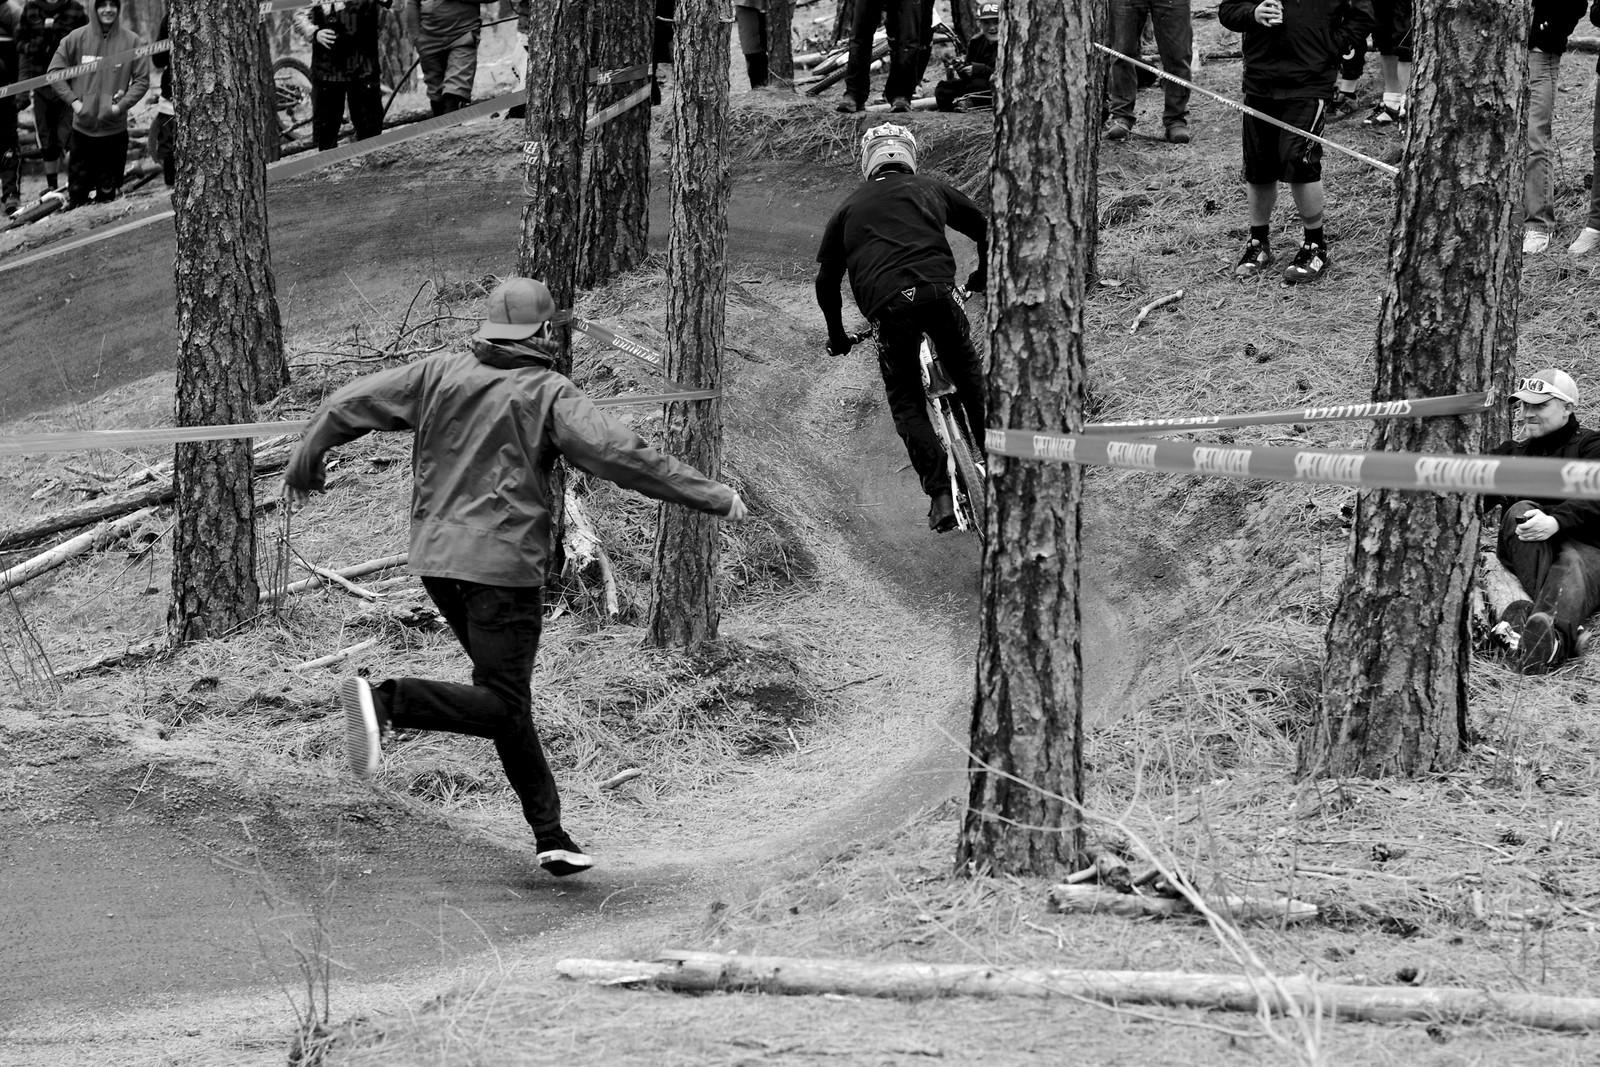 Team Work Makes The Dream Work  - corytepper.com - Mountain Biking Pictures - Vital MTB